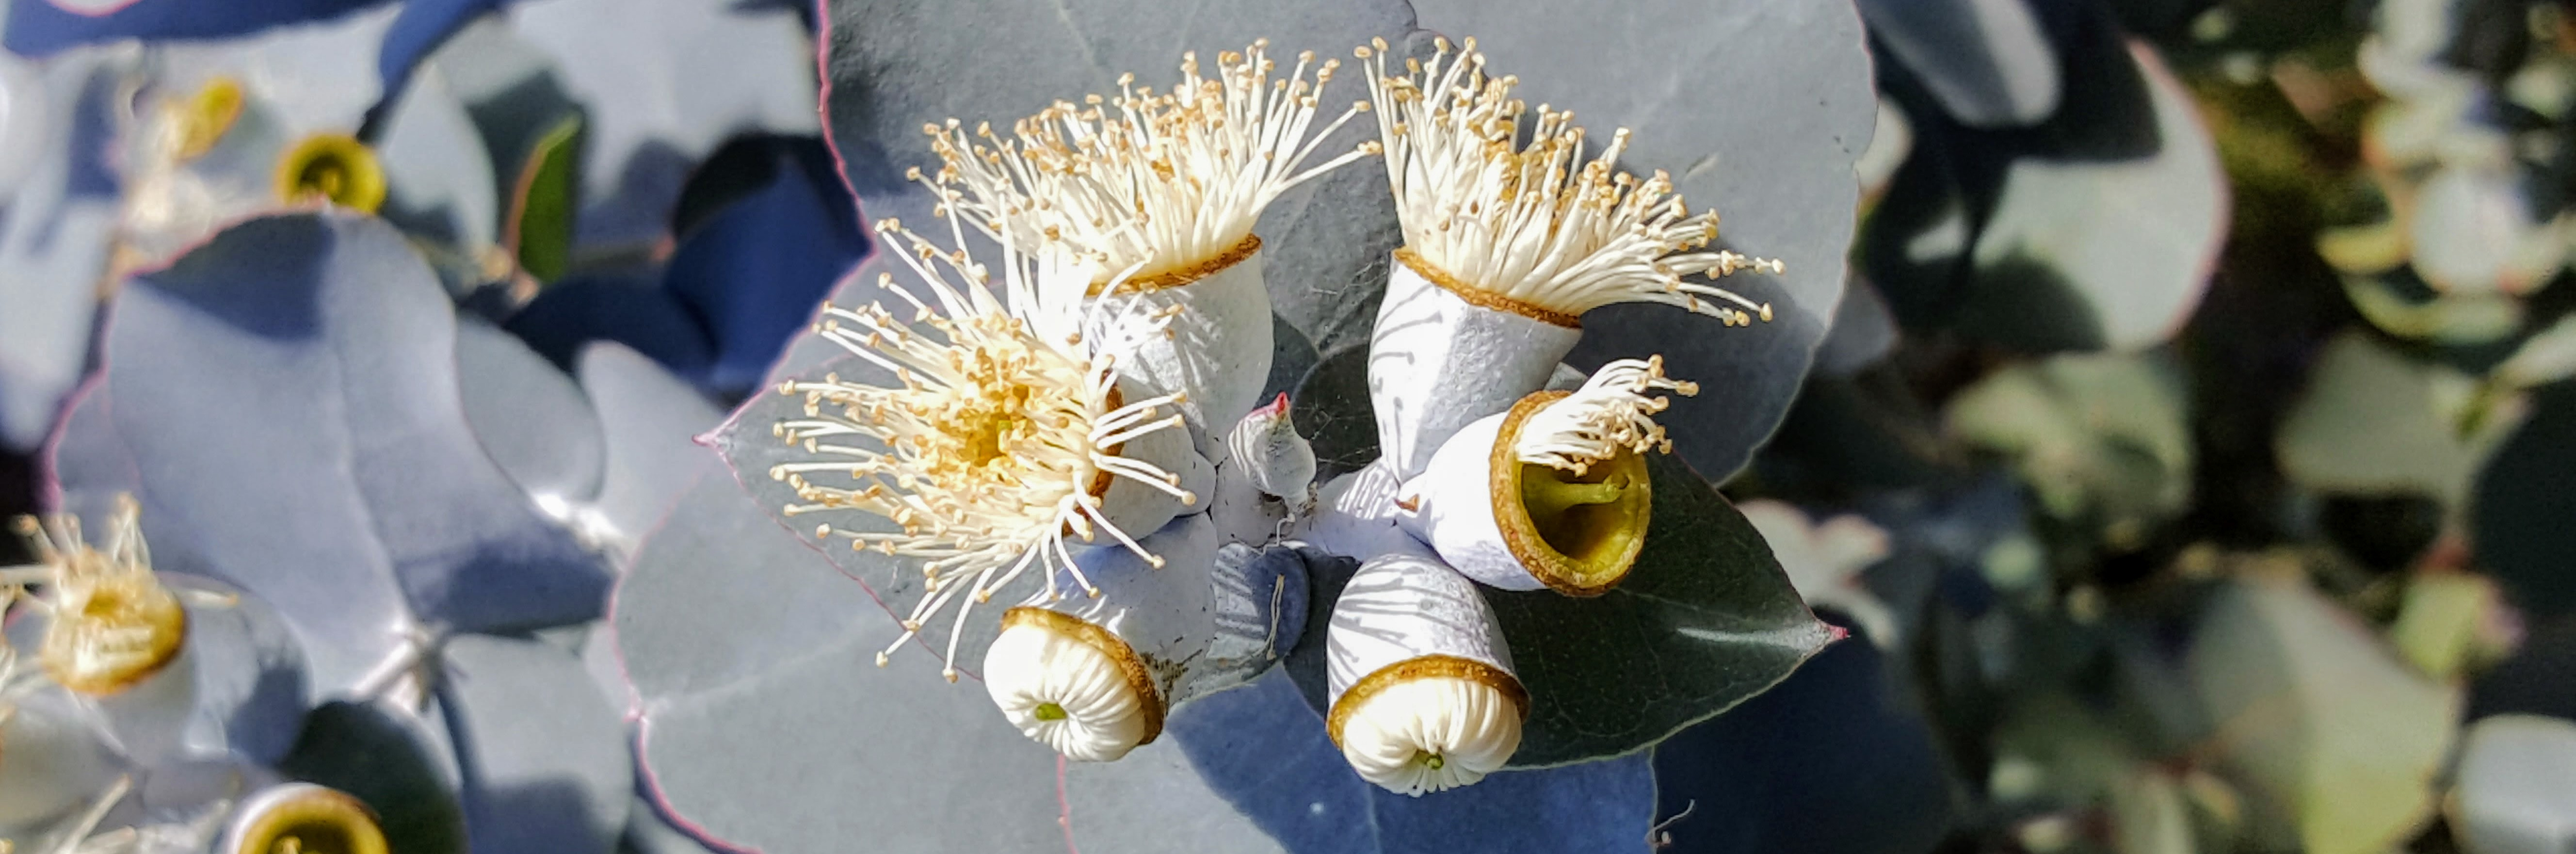 Eucalyptus-cordata-in-flower